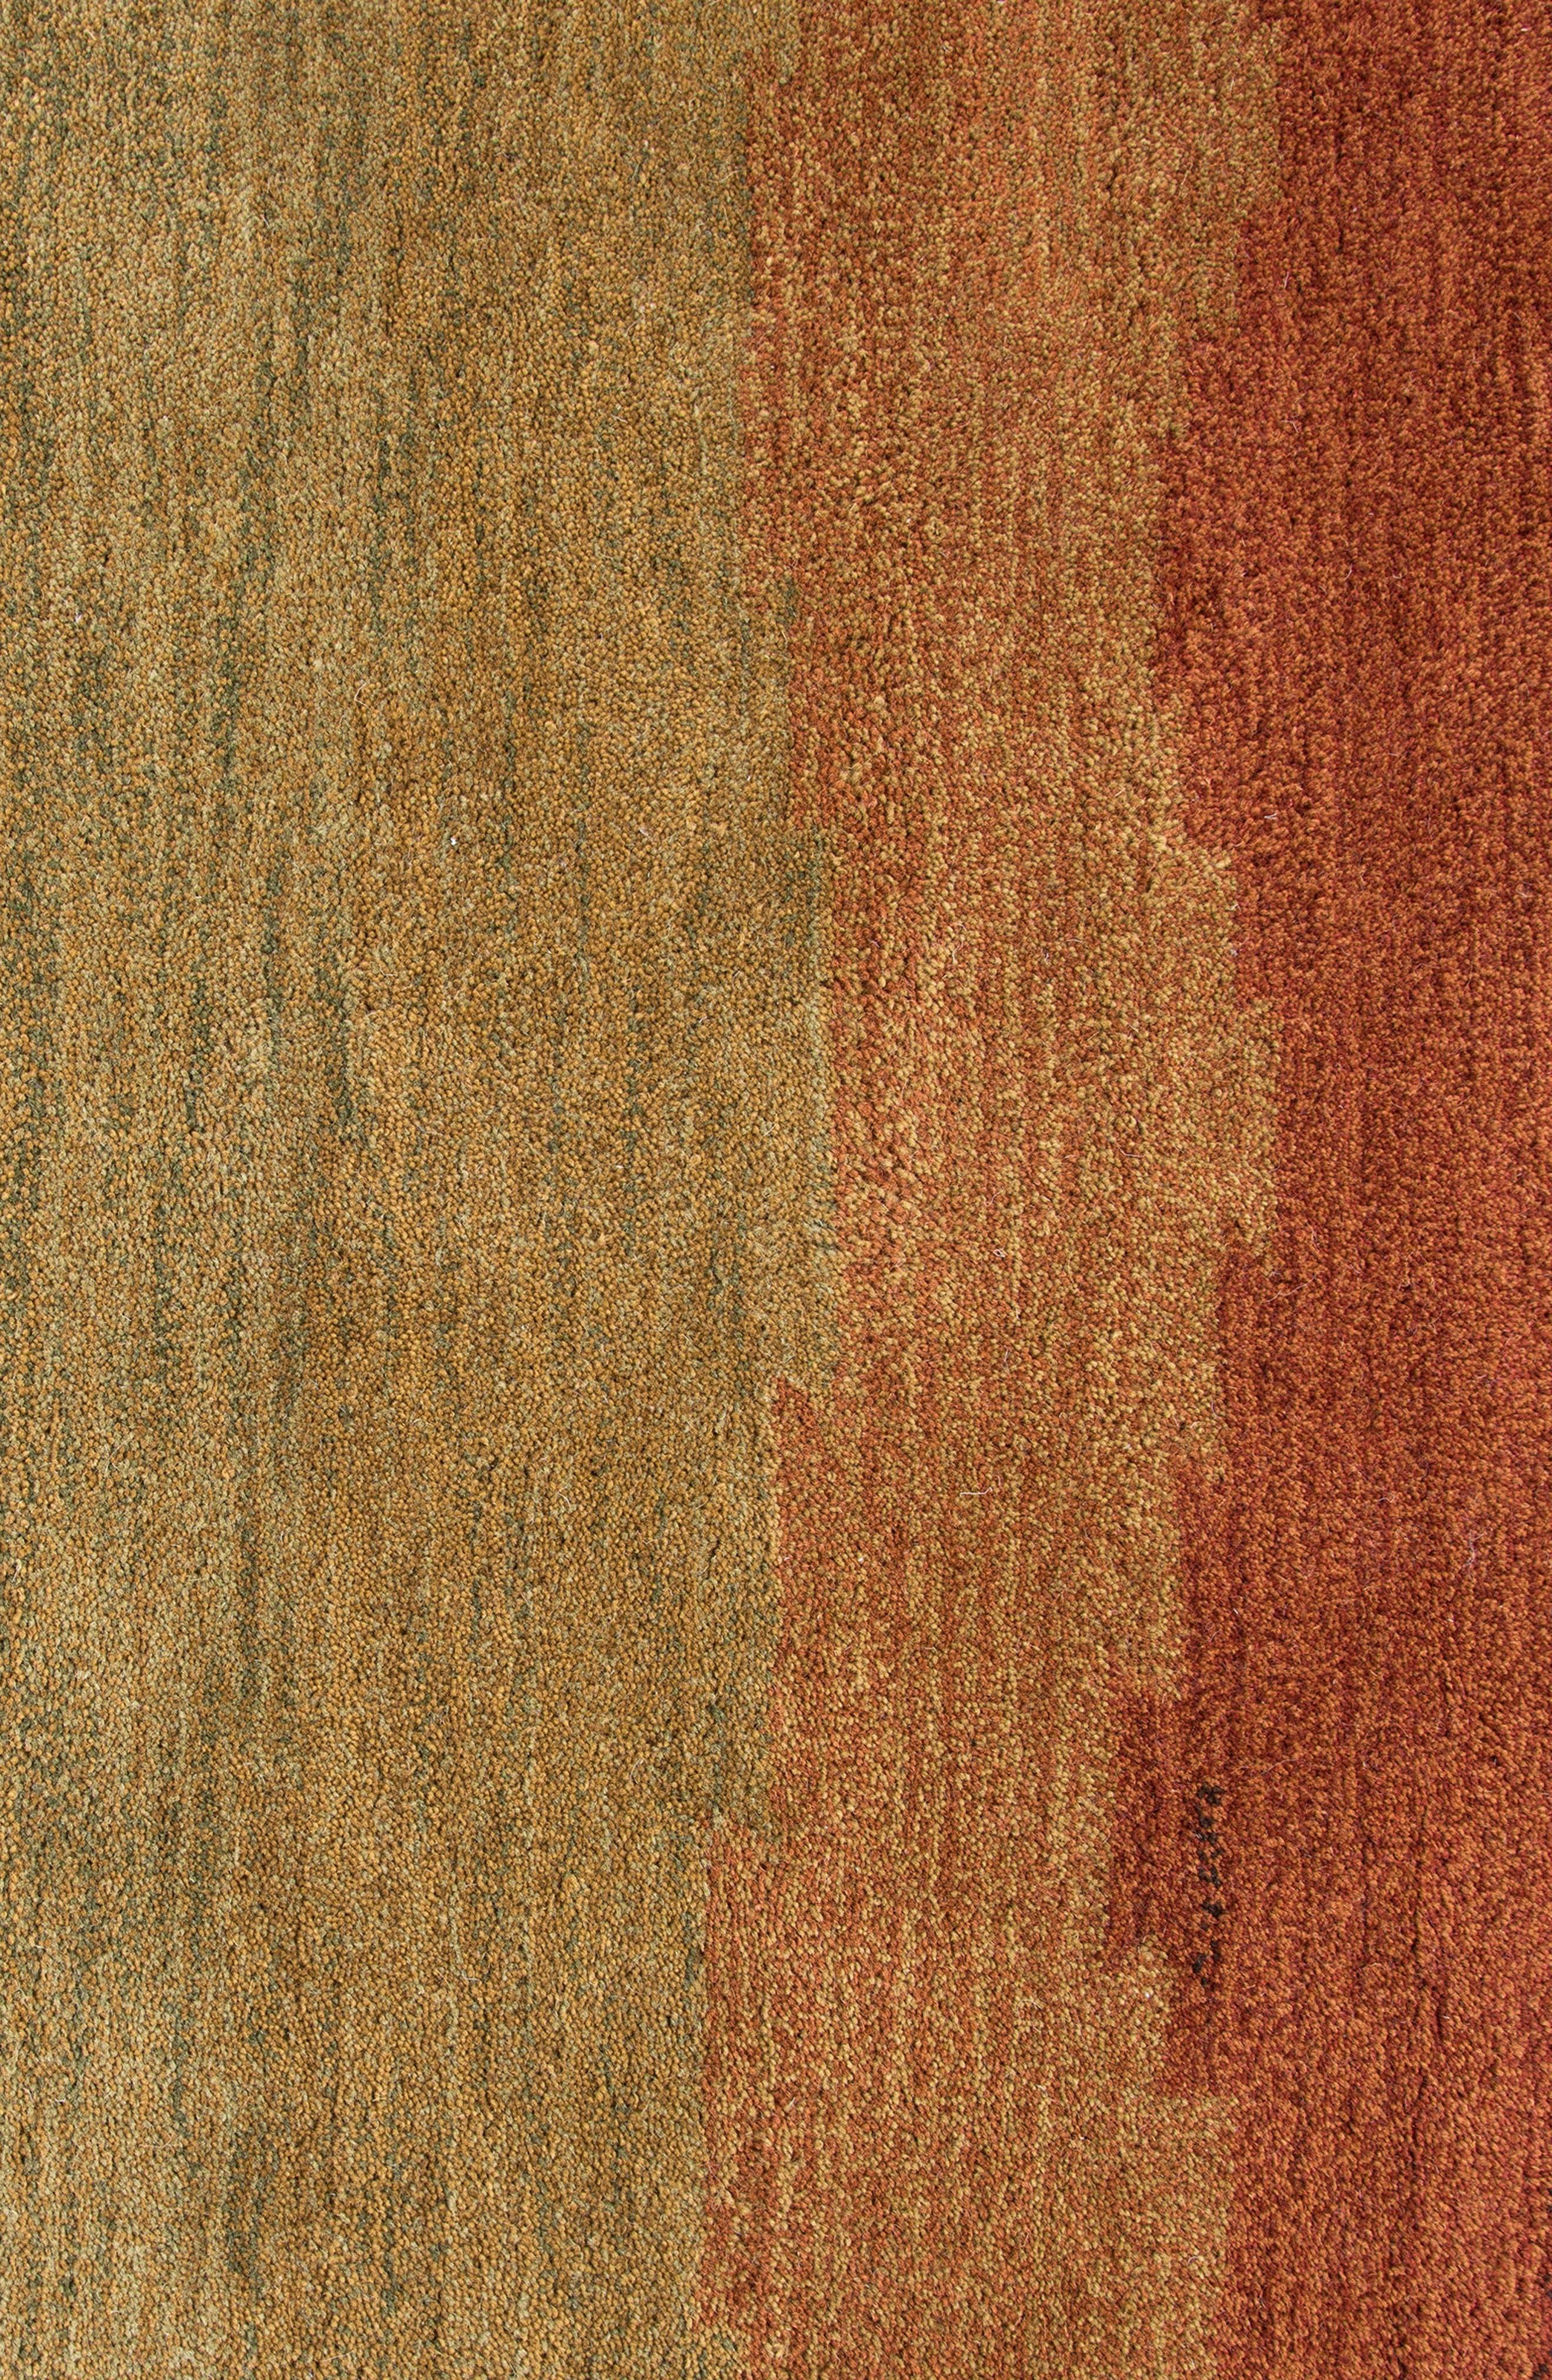 Desert Oasis Hand Tufted Wool Area Rug,                             Alternate thumbnail 4, color,                             220